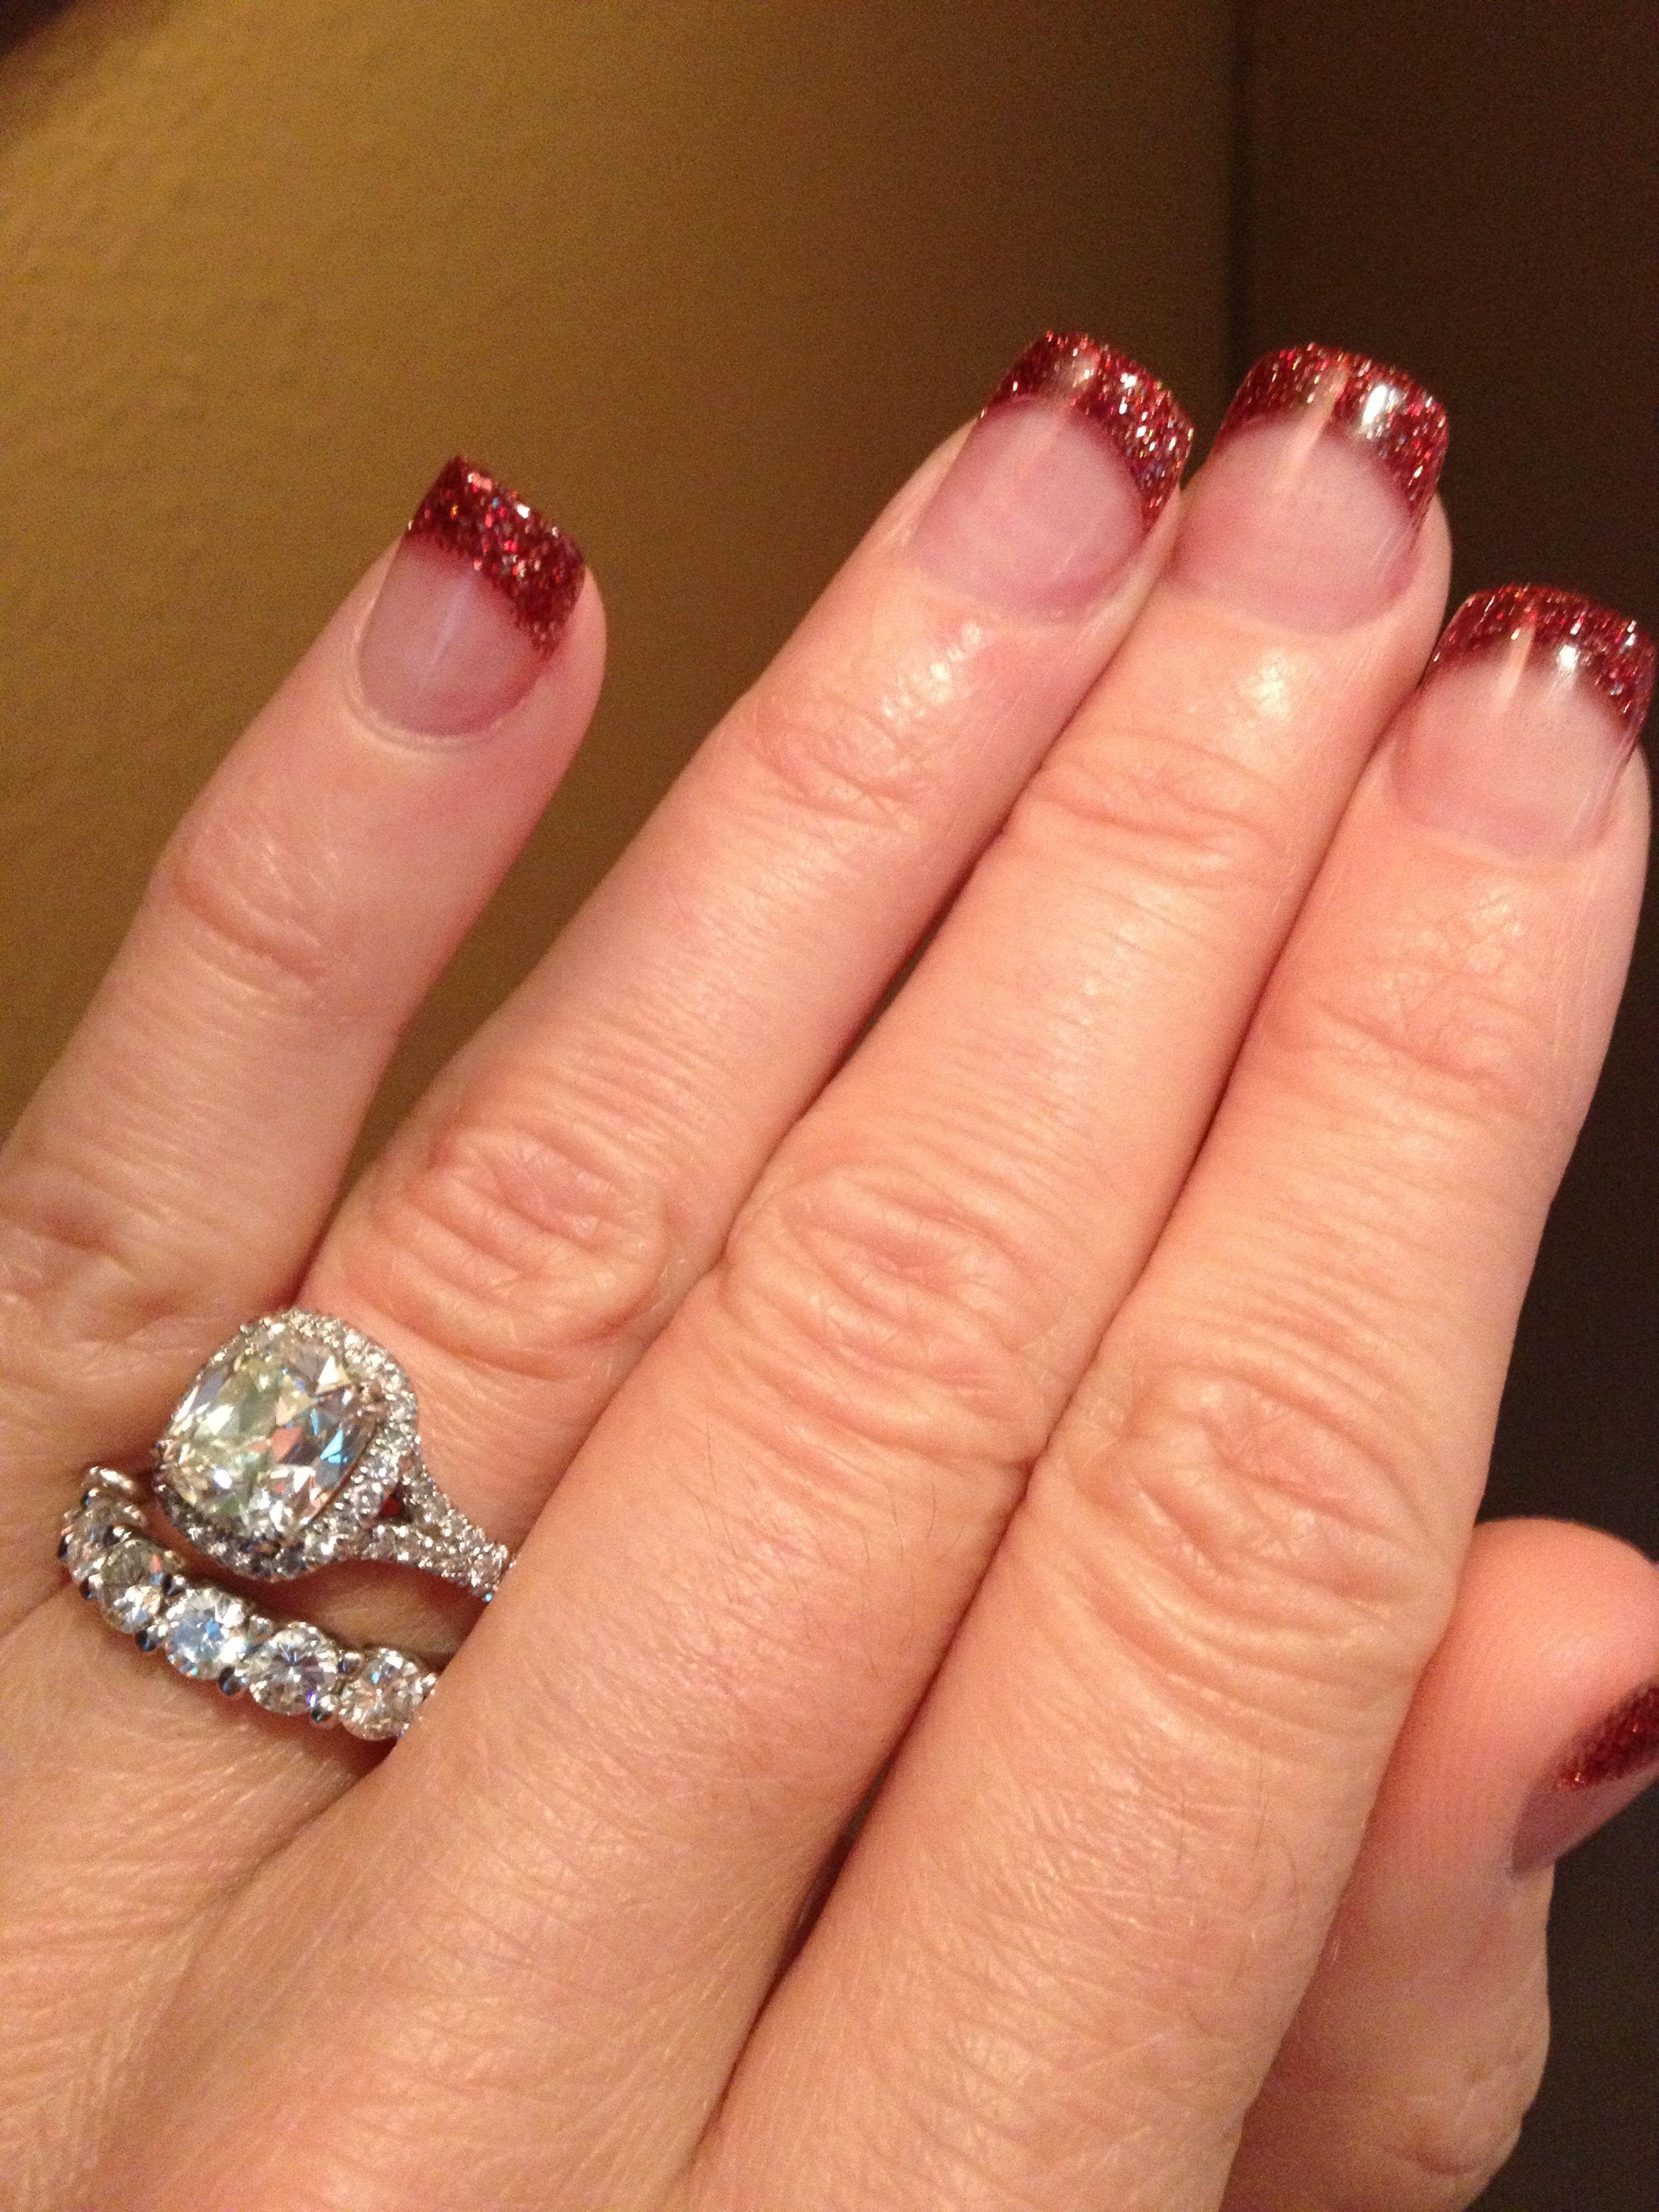 New Cushion Cut Halo Engagement Rings and Wedding Band